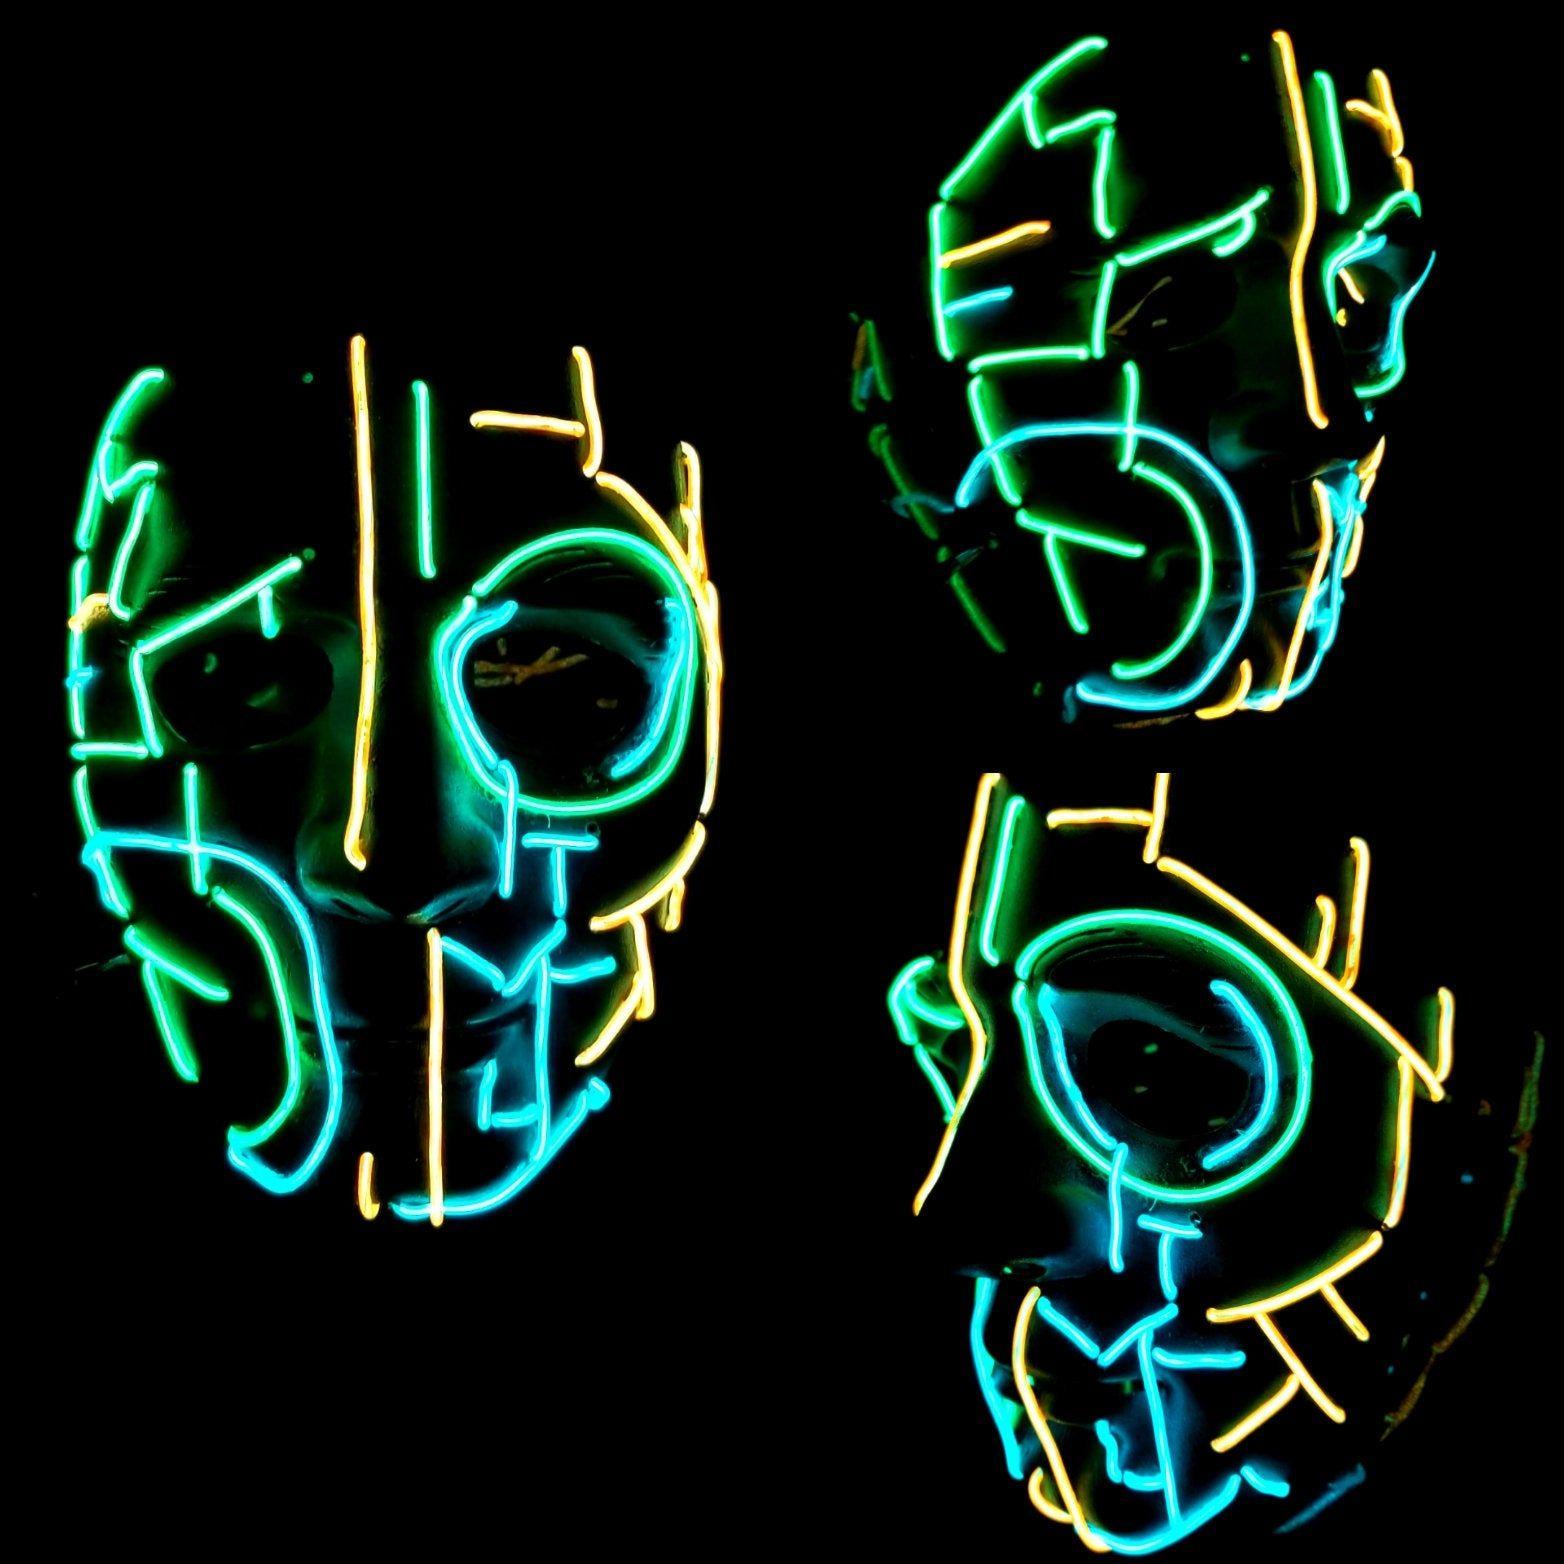 Halloween Festivals 2020 Edm ROBO LED Light Up MaskEl WireRave | Etsy in 2020 | Rave mask